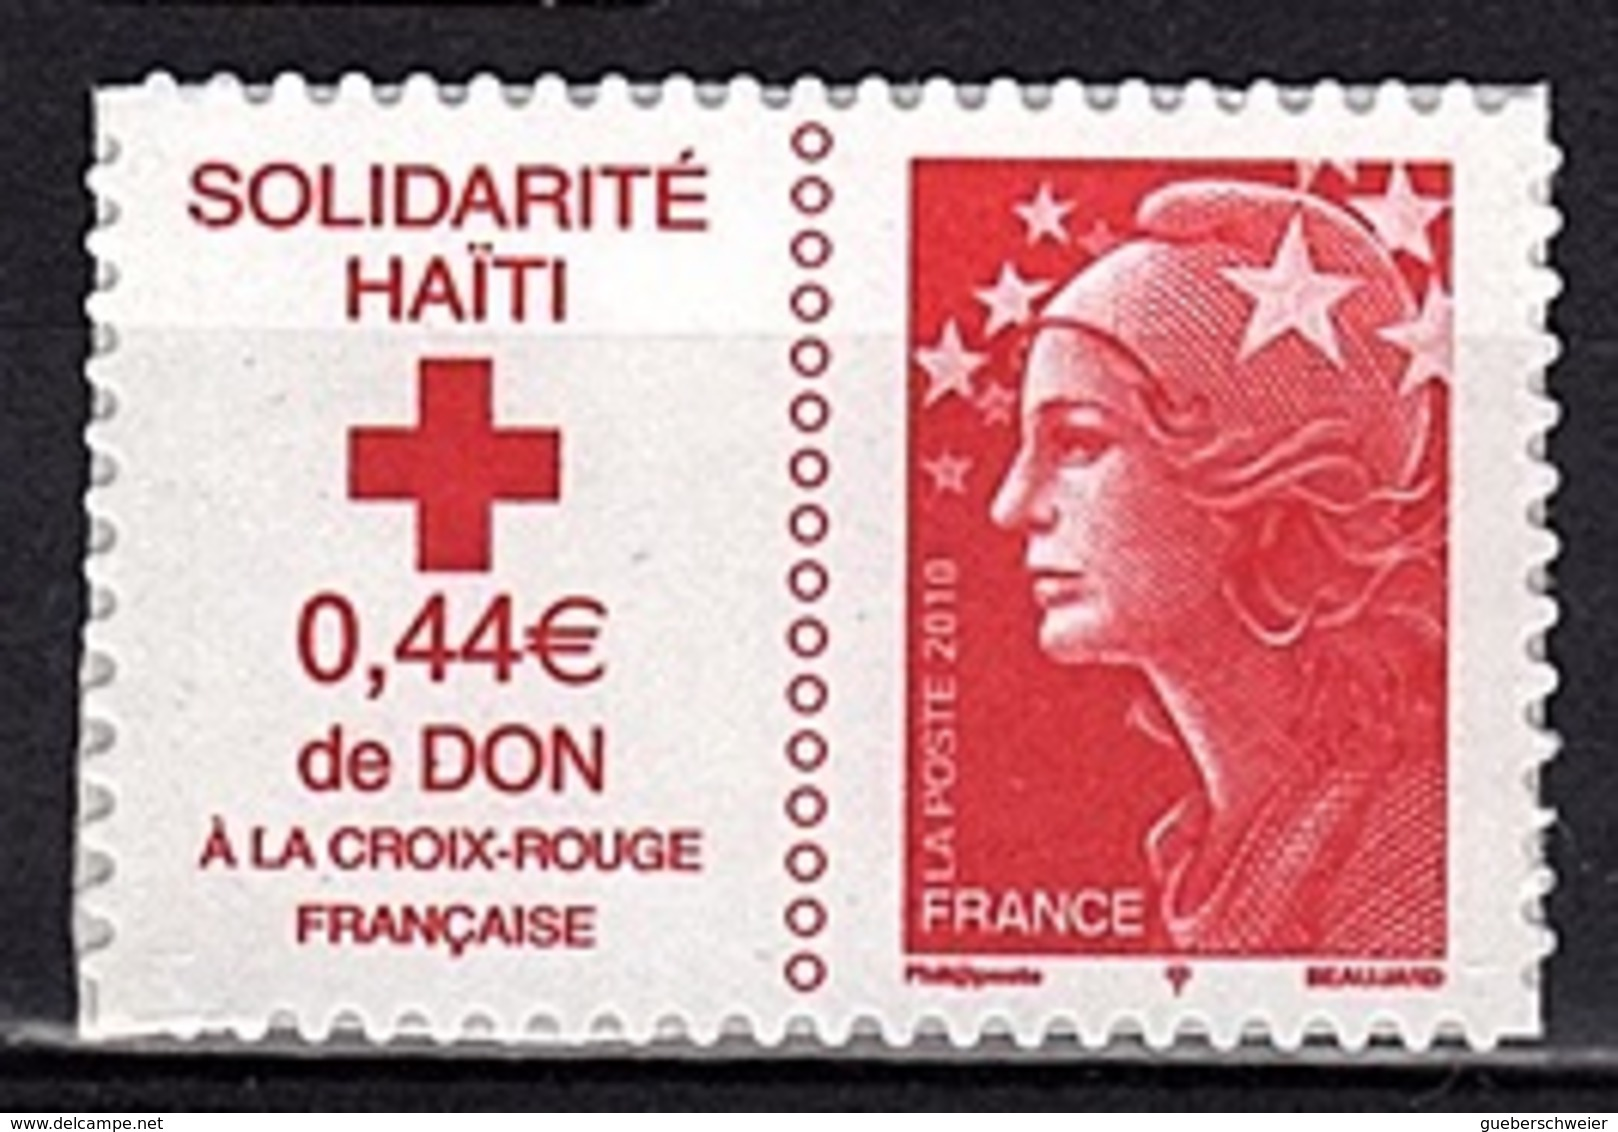 ADH 70 - FRANCE Adhésifs N° 388 Neufs** Surtaxe Haïti - Adhésifs (autocollants)